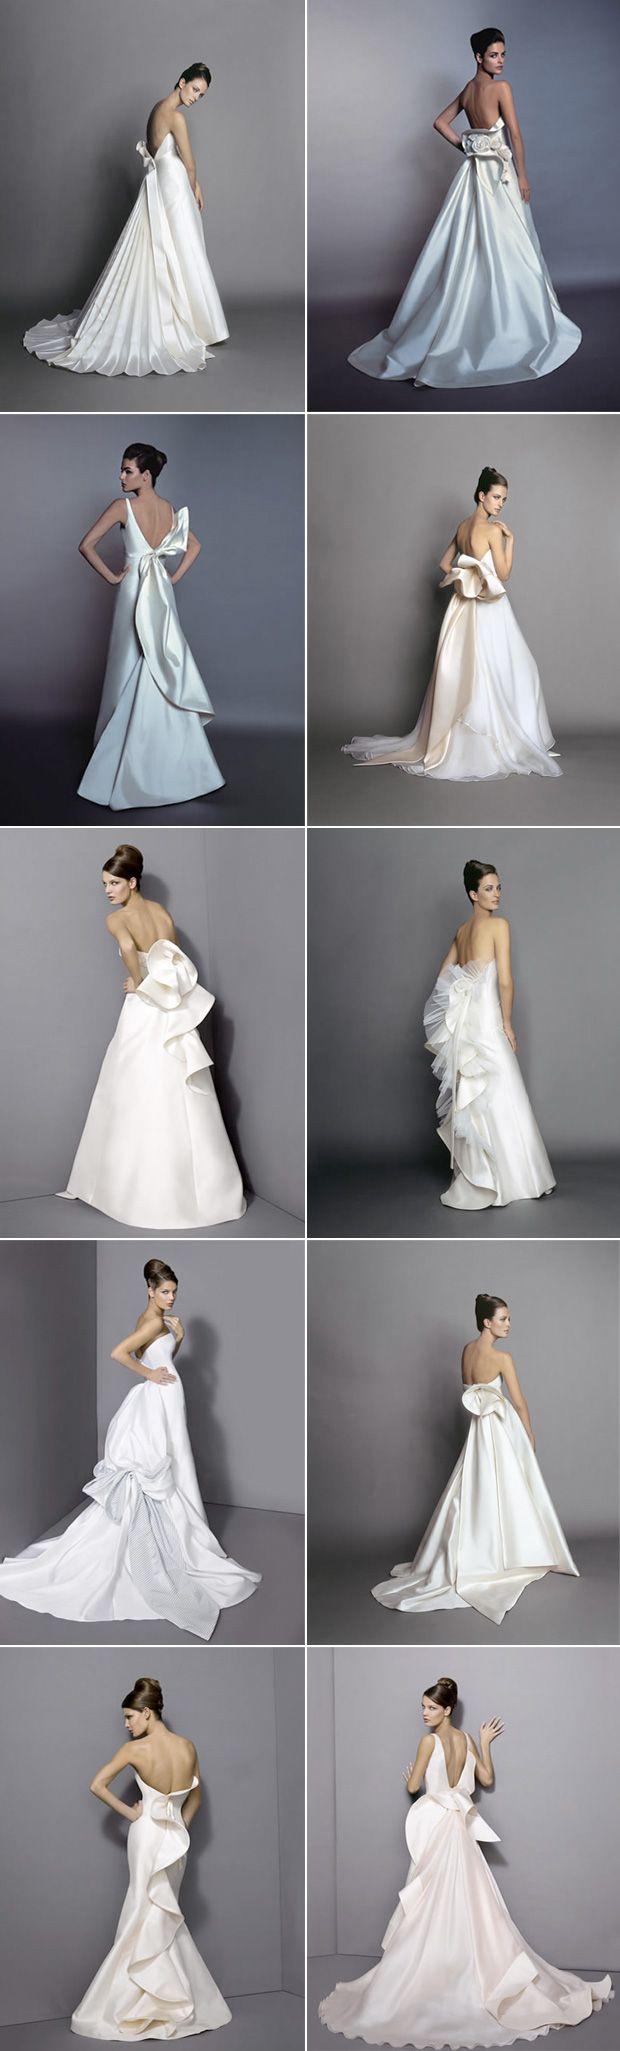 Antonio Riva Wedding Dresses | OMG I'm Getting Married UK Wedding Blog | UK Wedding Design and Inspiration for the fabulous and fashion forward bride to be.